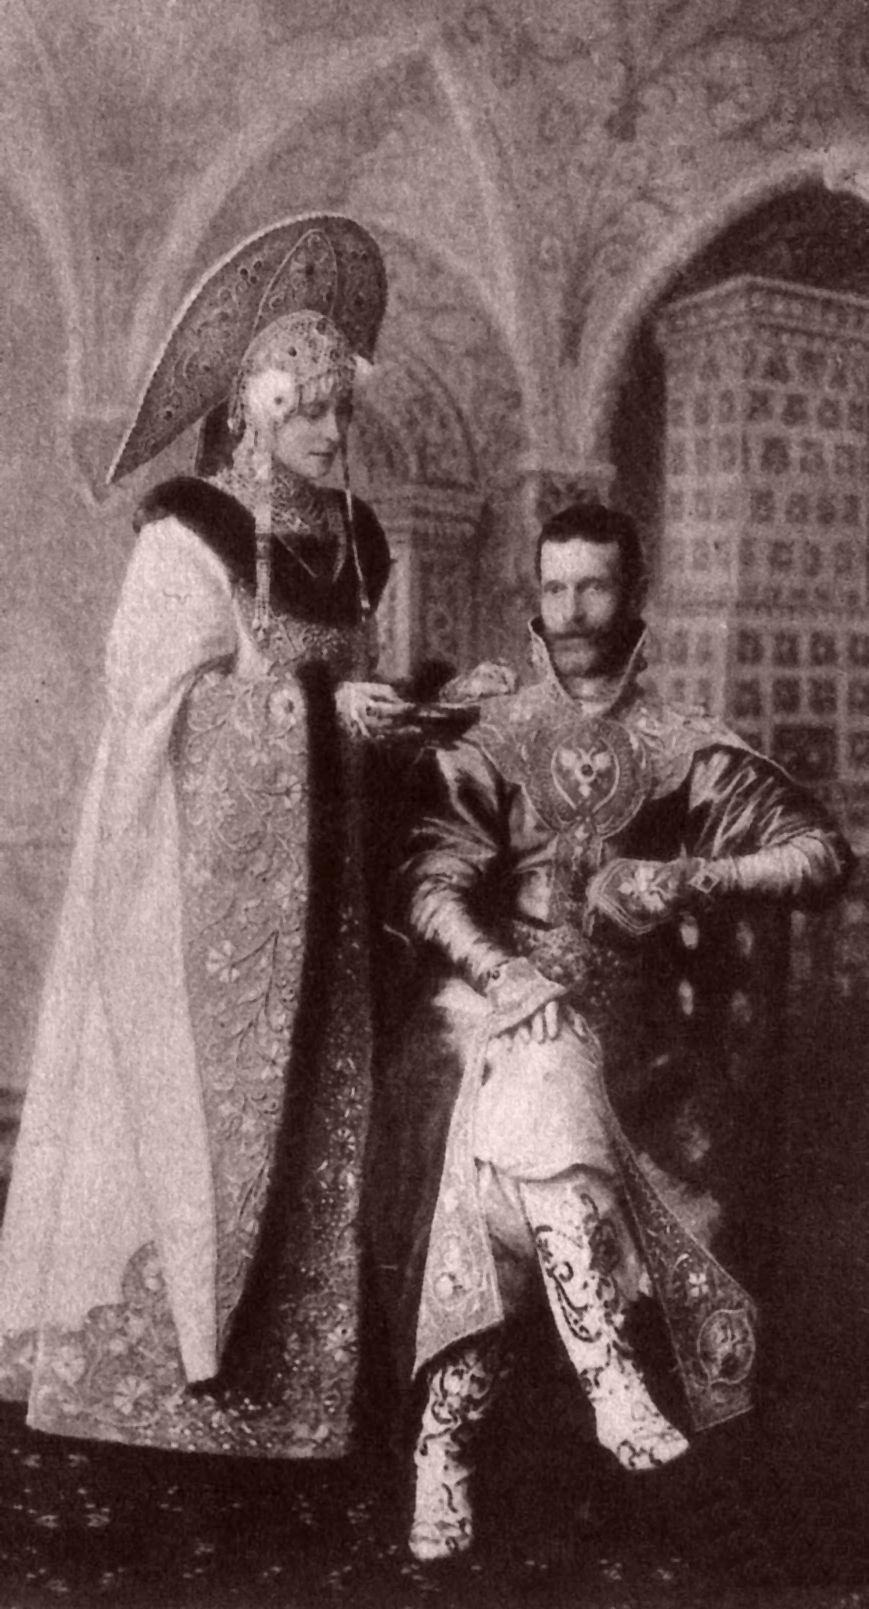 "Grand Duchess ""Ella"" with husband,  Grand Duke Sergei. 1903: The Ball at the Winter Palace http://www.retronaut.com/2013/04/the-ball-at-the-winter-palace/"